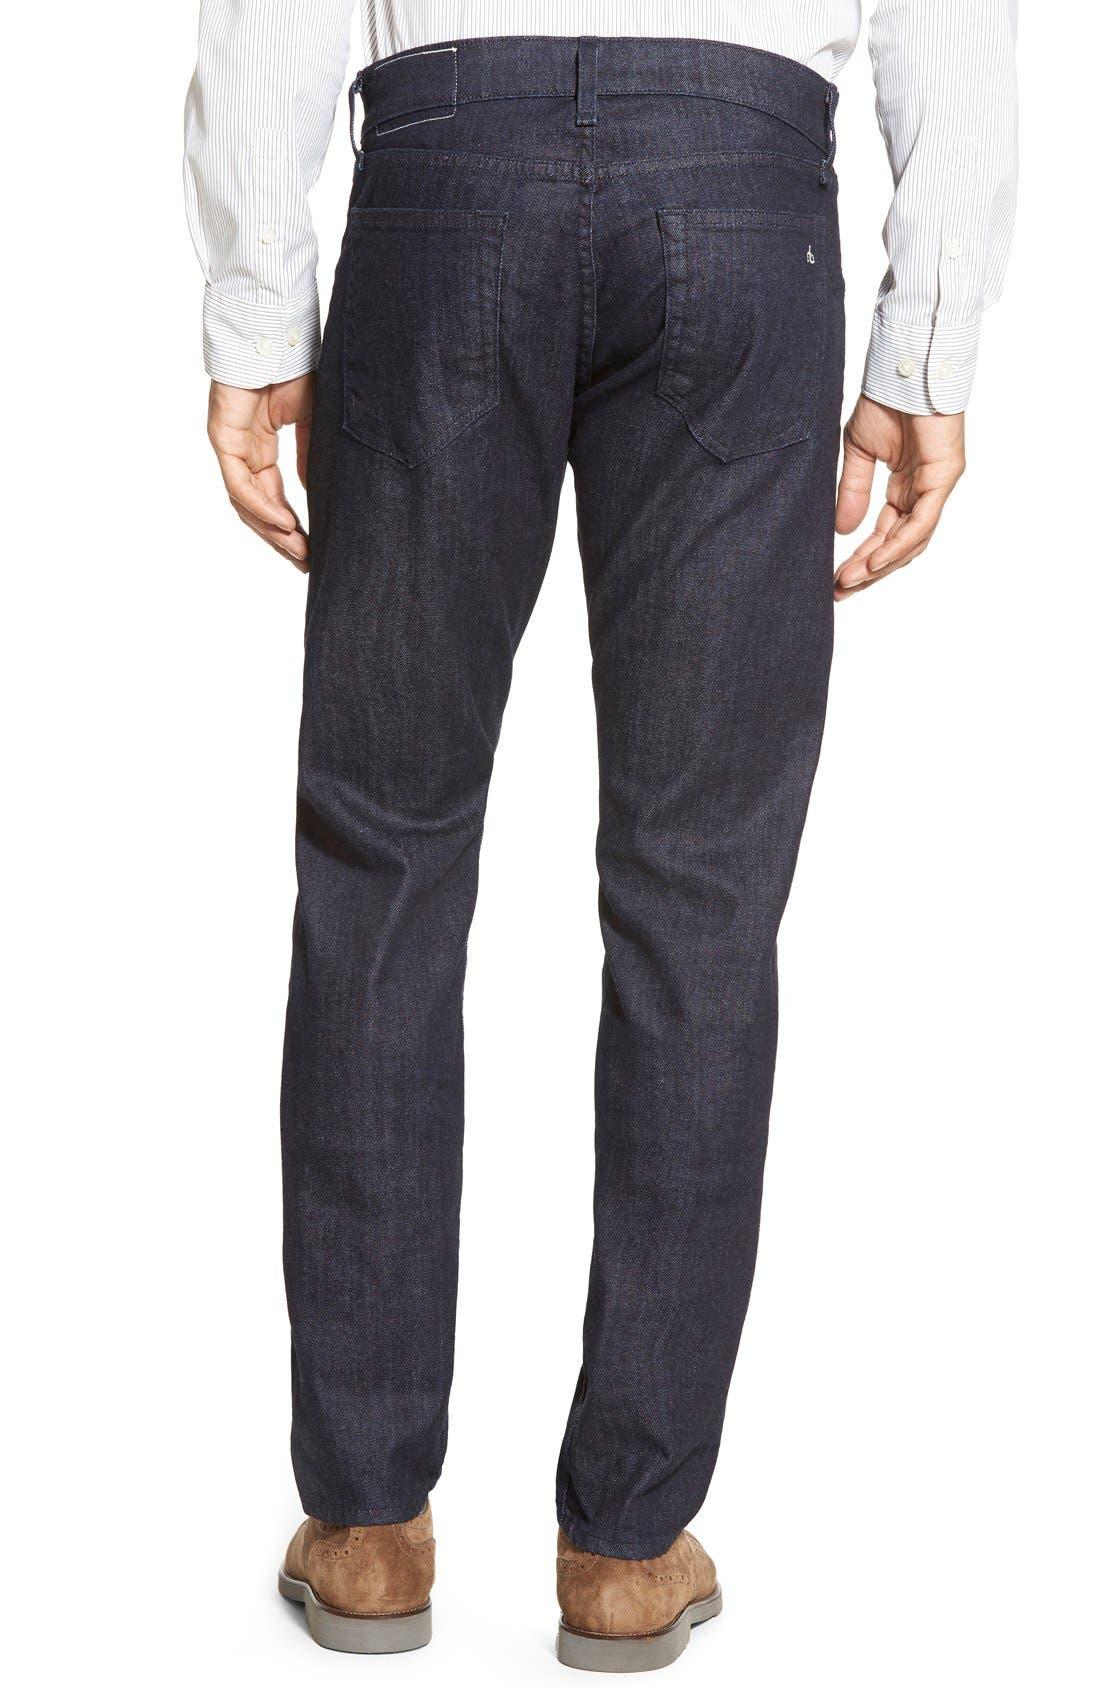 RAG & BONE, Standard Issue Fit 2 Slim Fit Jeans, Alternate thumbnail 4, color, TONAL RINSE